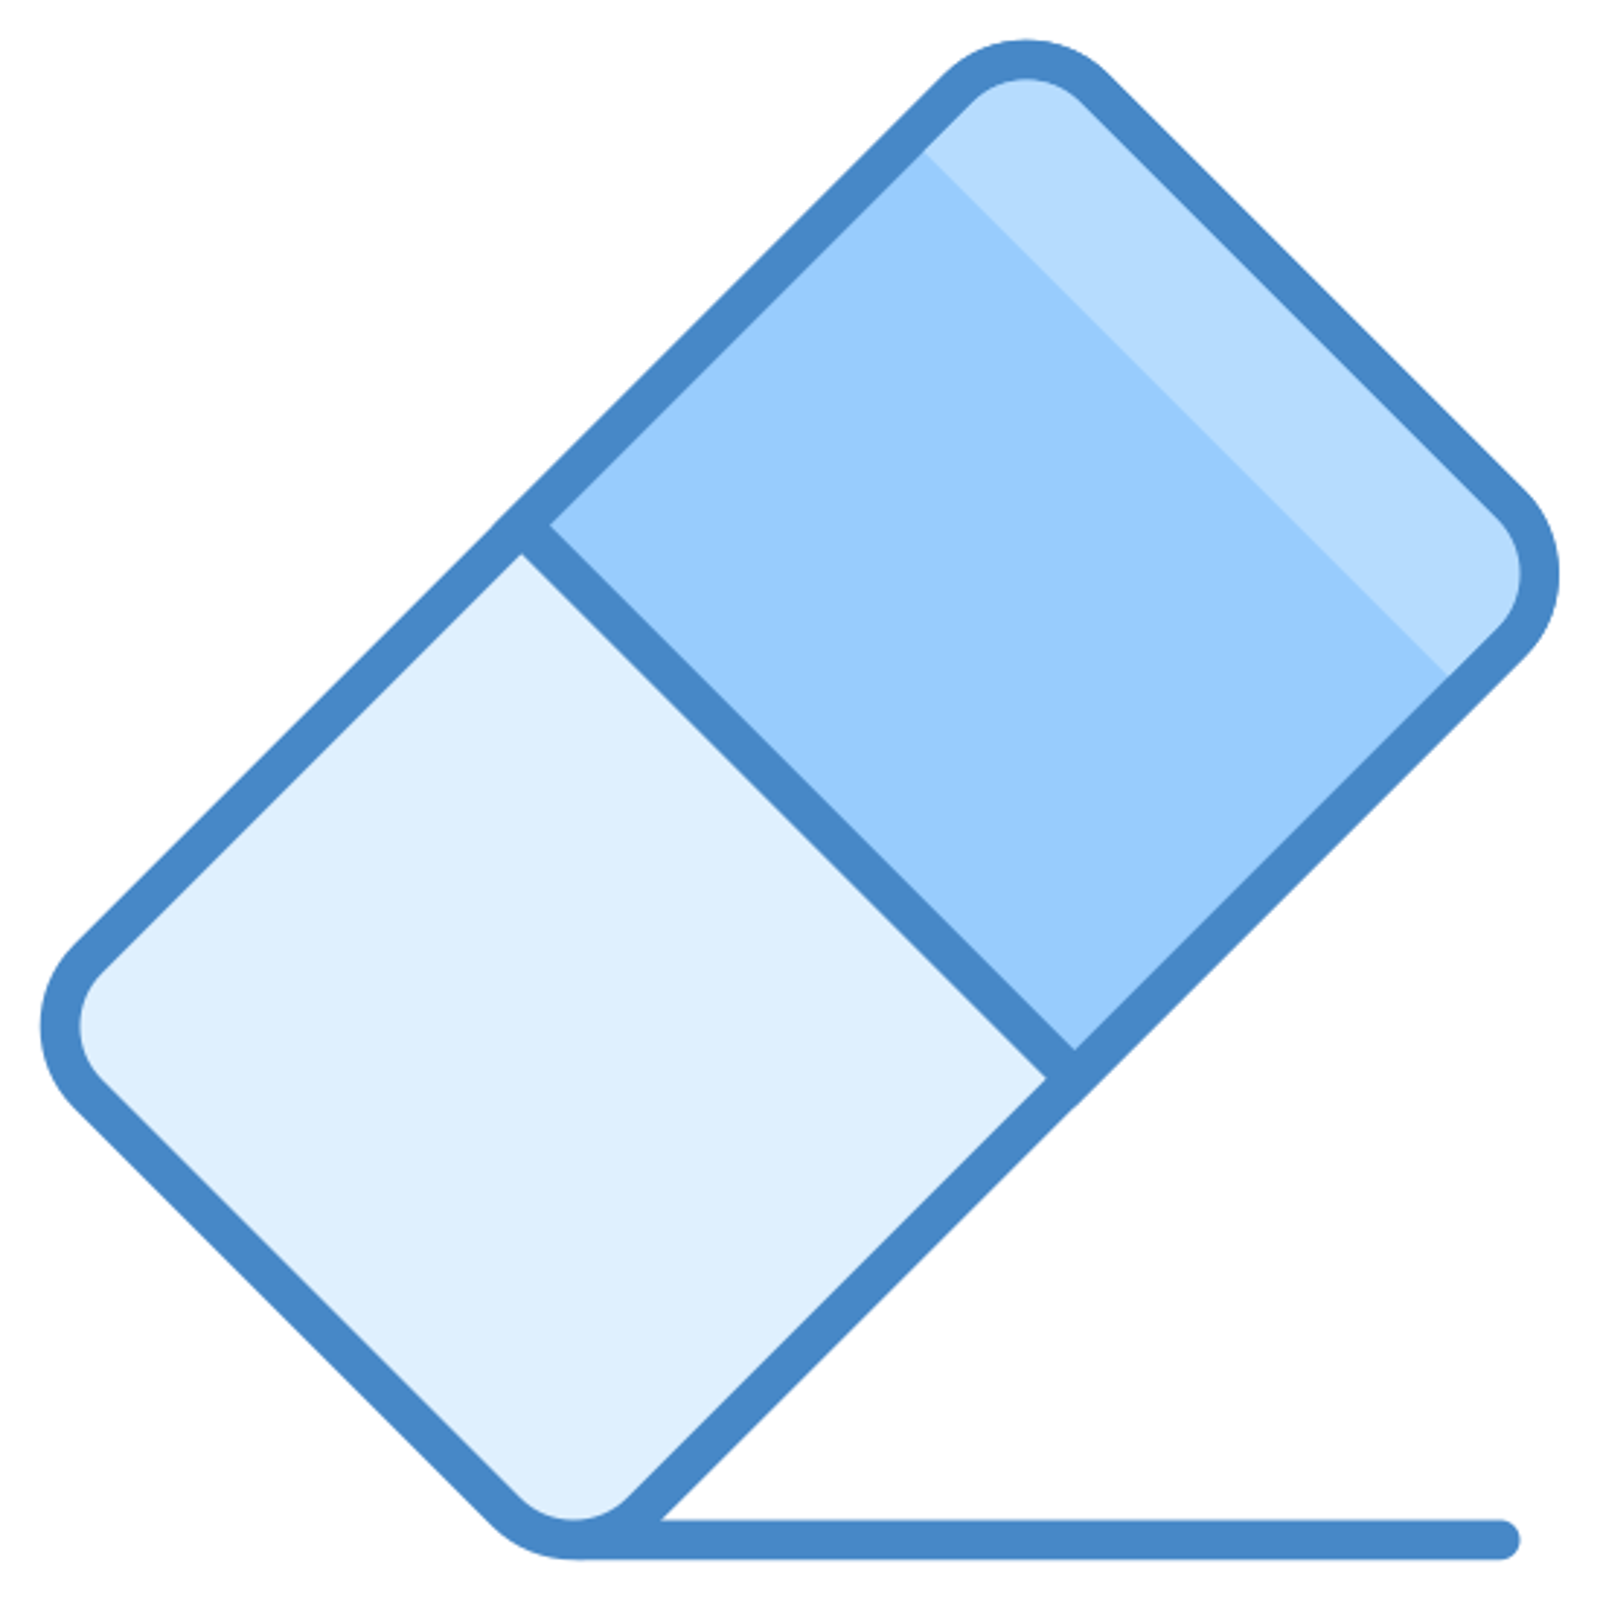 Gumka do mazania icon